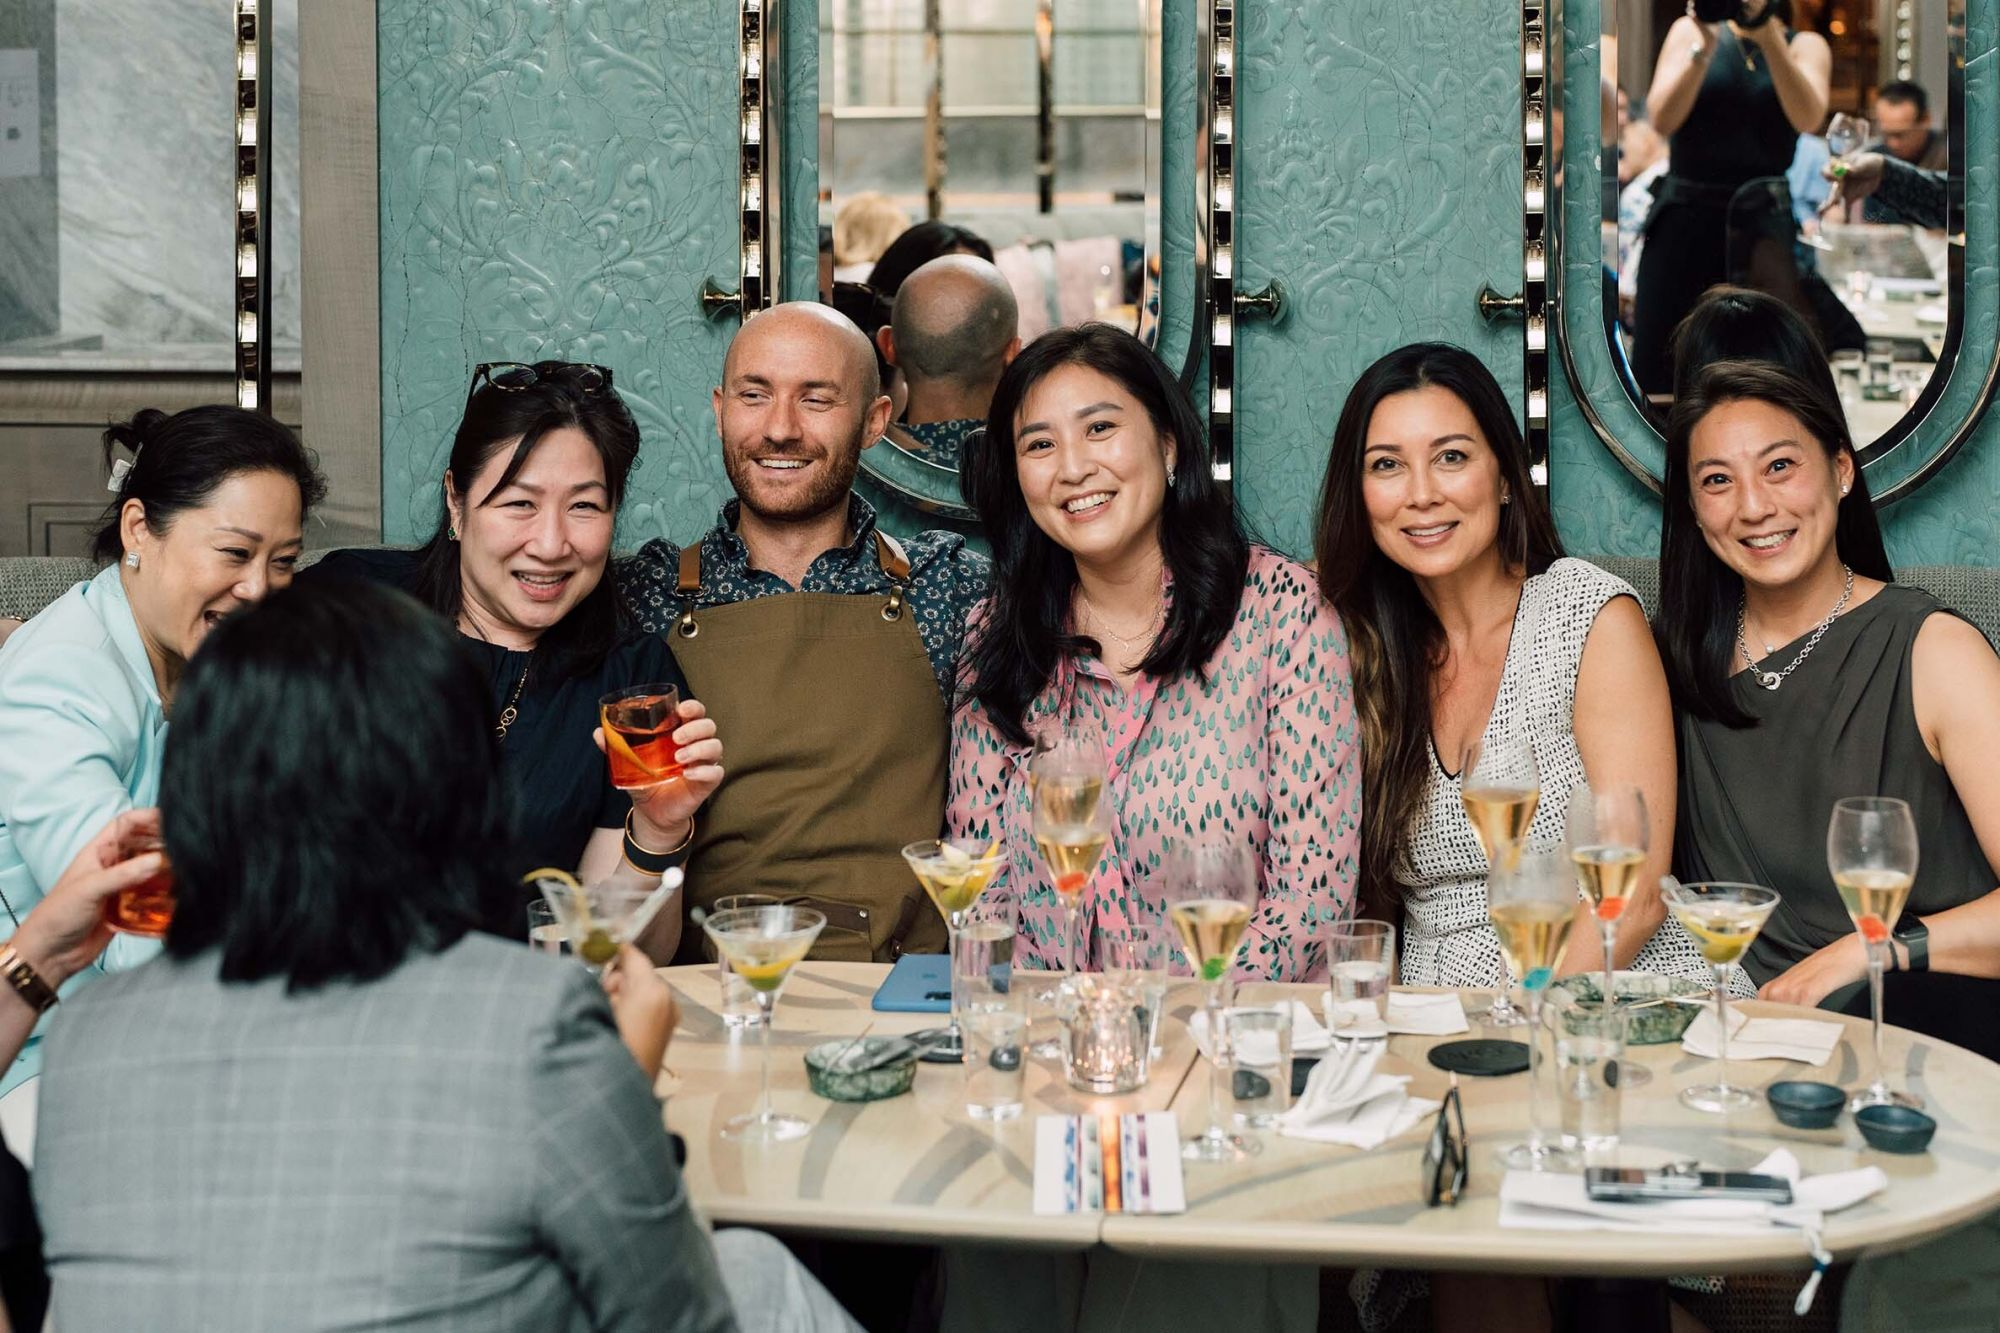 Yuda Chan, Odelia Cheung, Lorenzo Antinori, Leigh Tung Chou, Michele Li and Pamela Tung